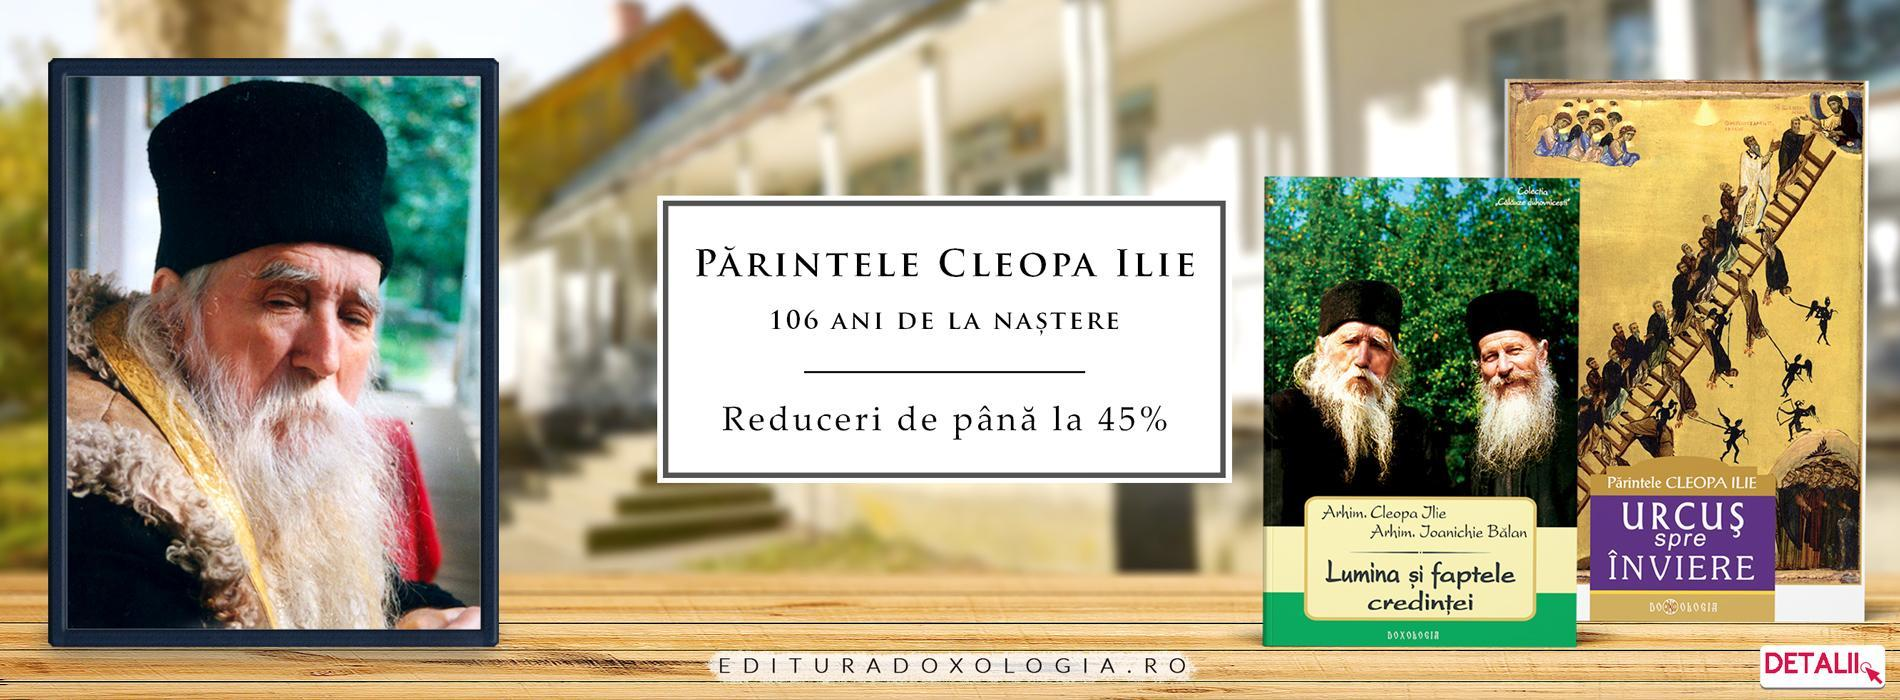 Părintele Cleopa Ilie, 106 ani de la naștere